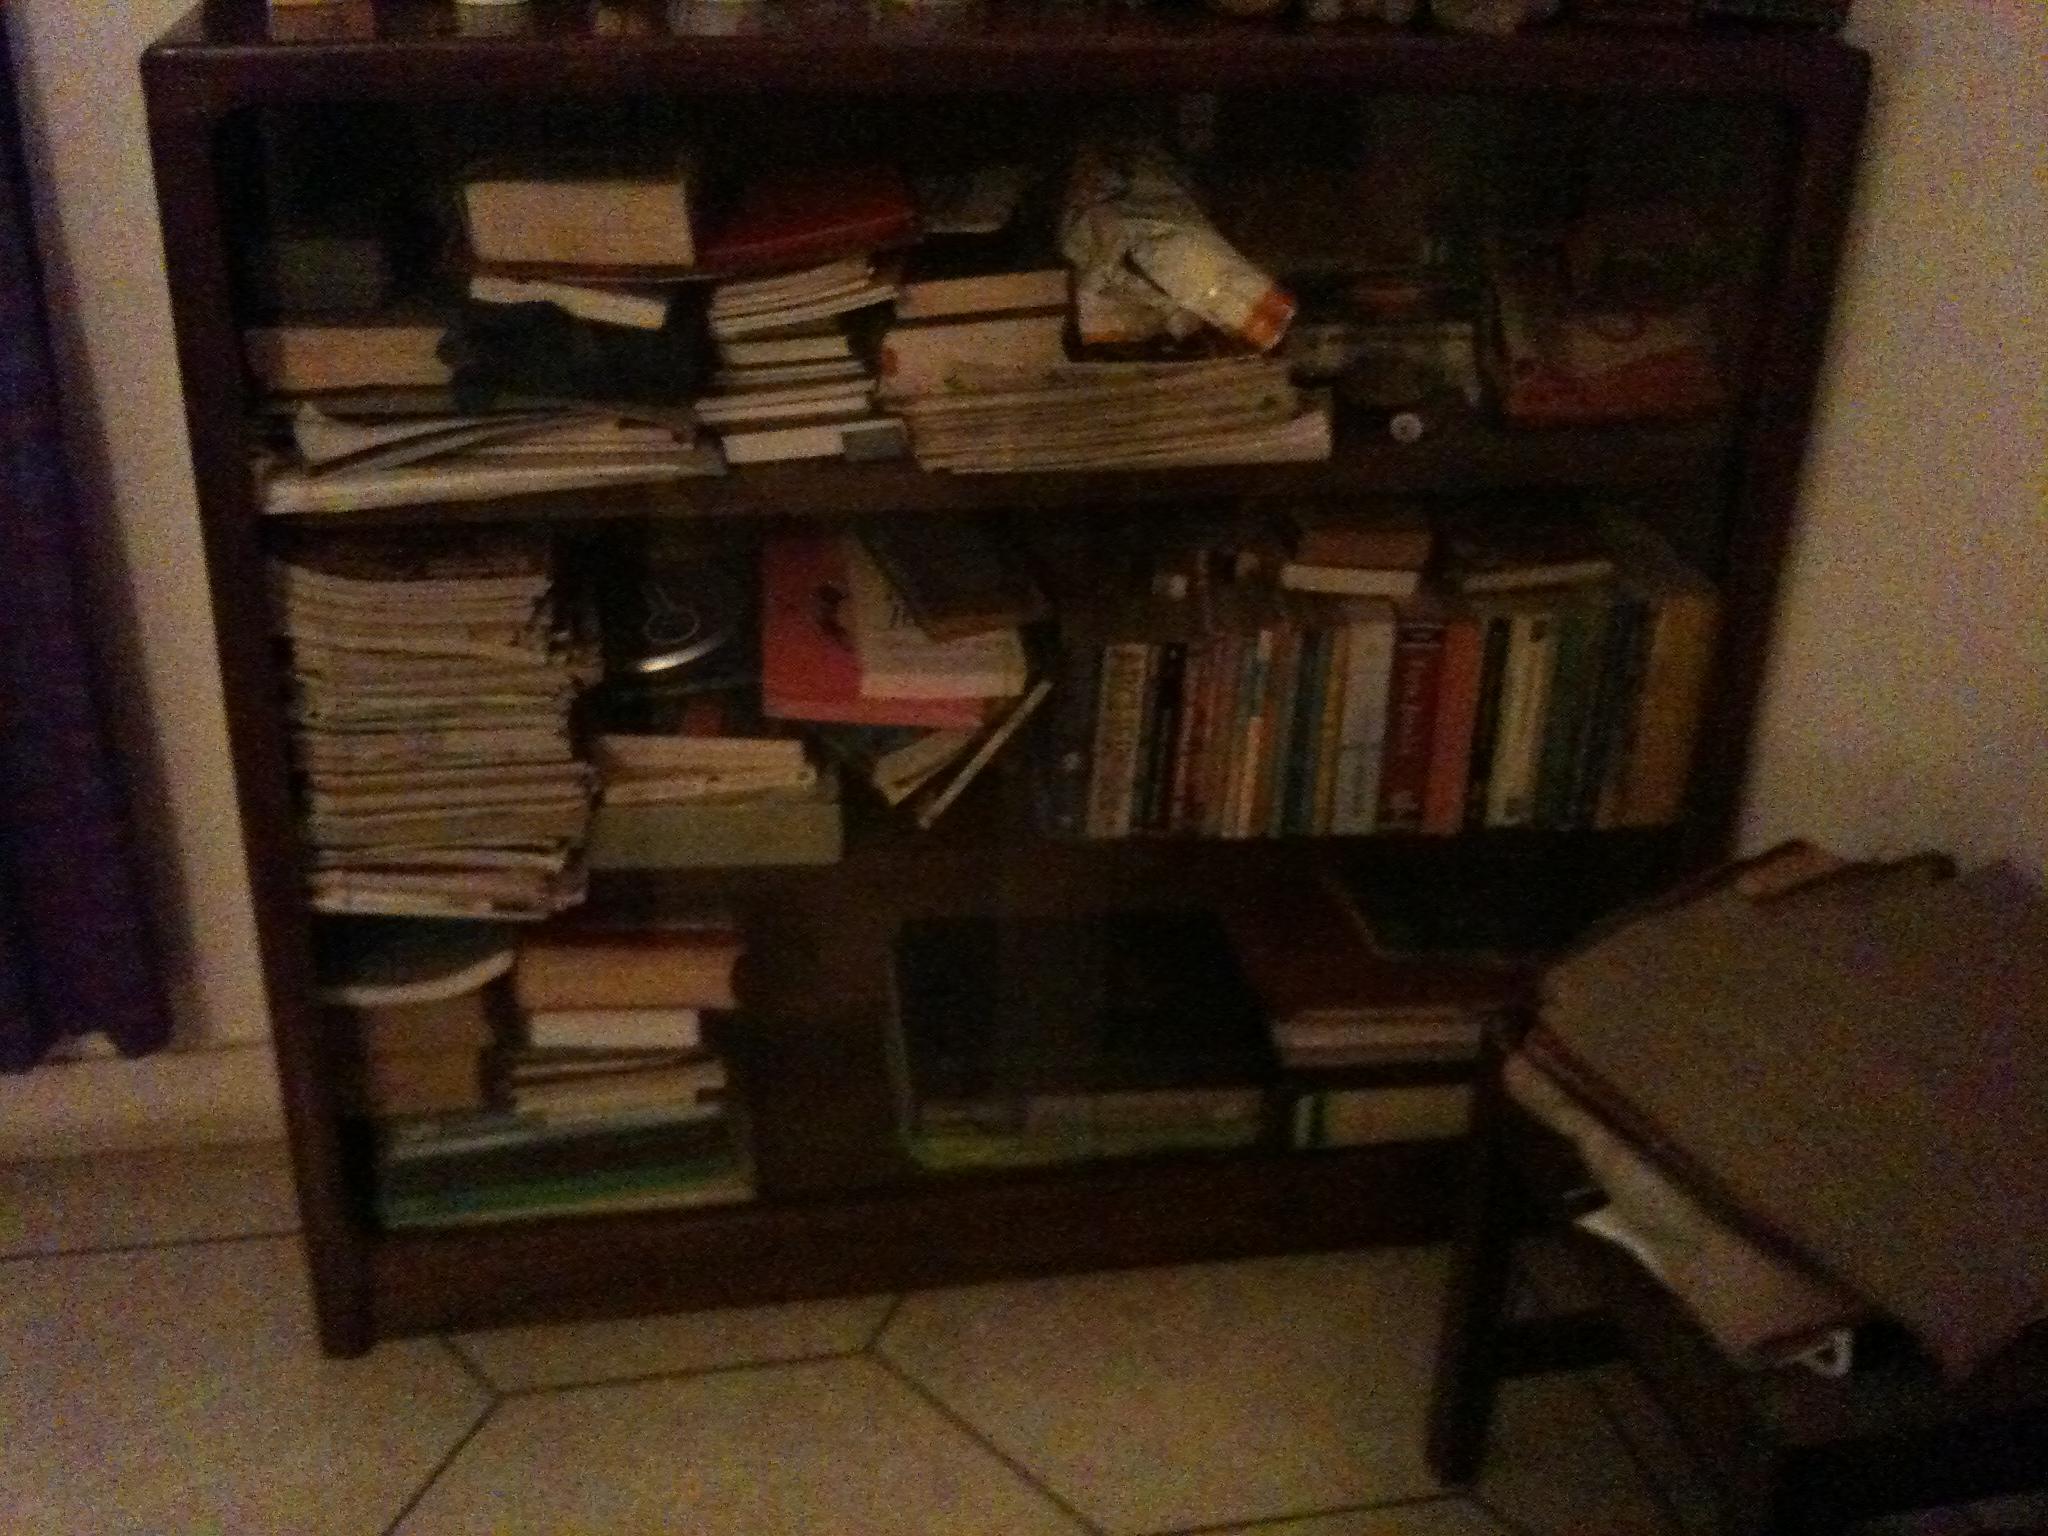 TV Fridge Dining Table Bamboo Sofa Tv Trolley Shelf etc... | ClickBD large image 1